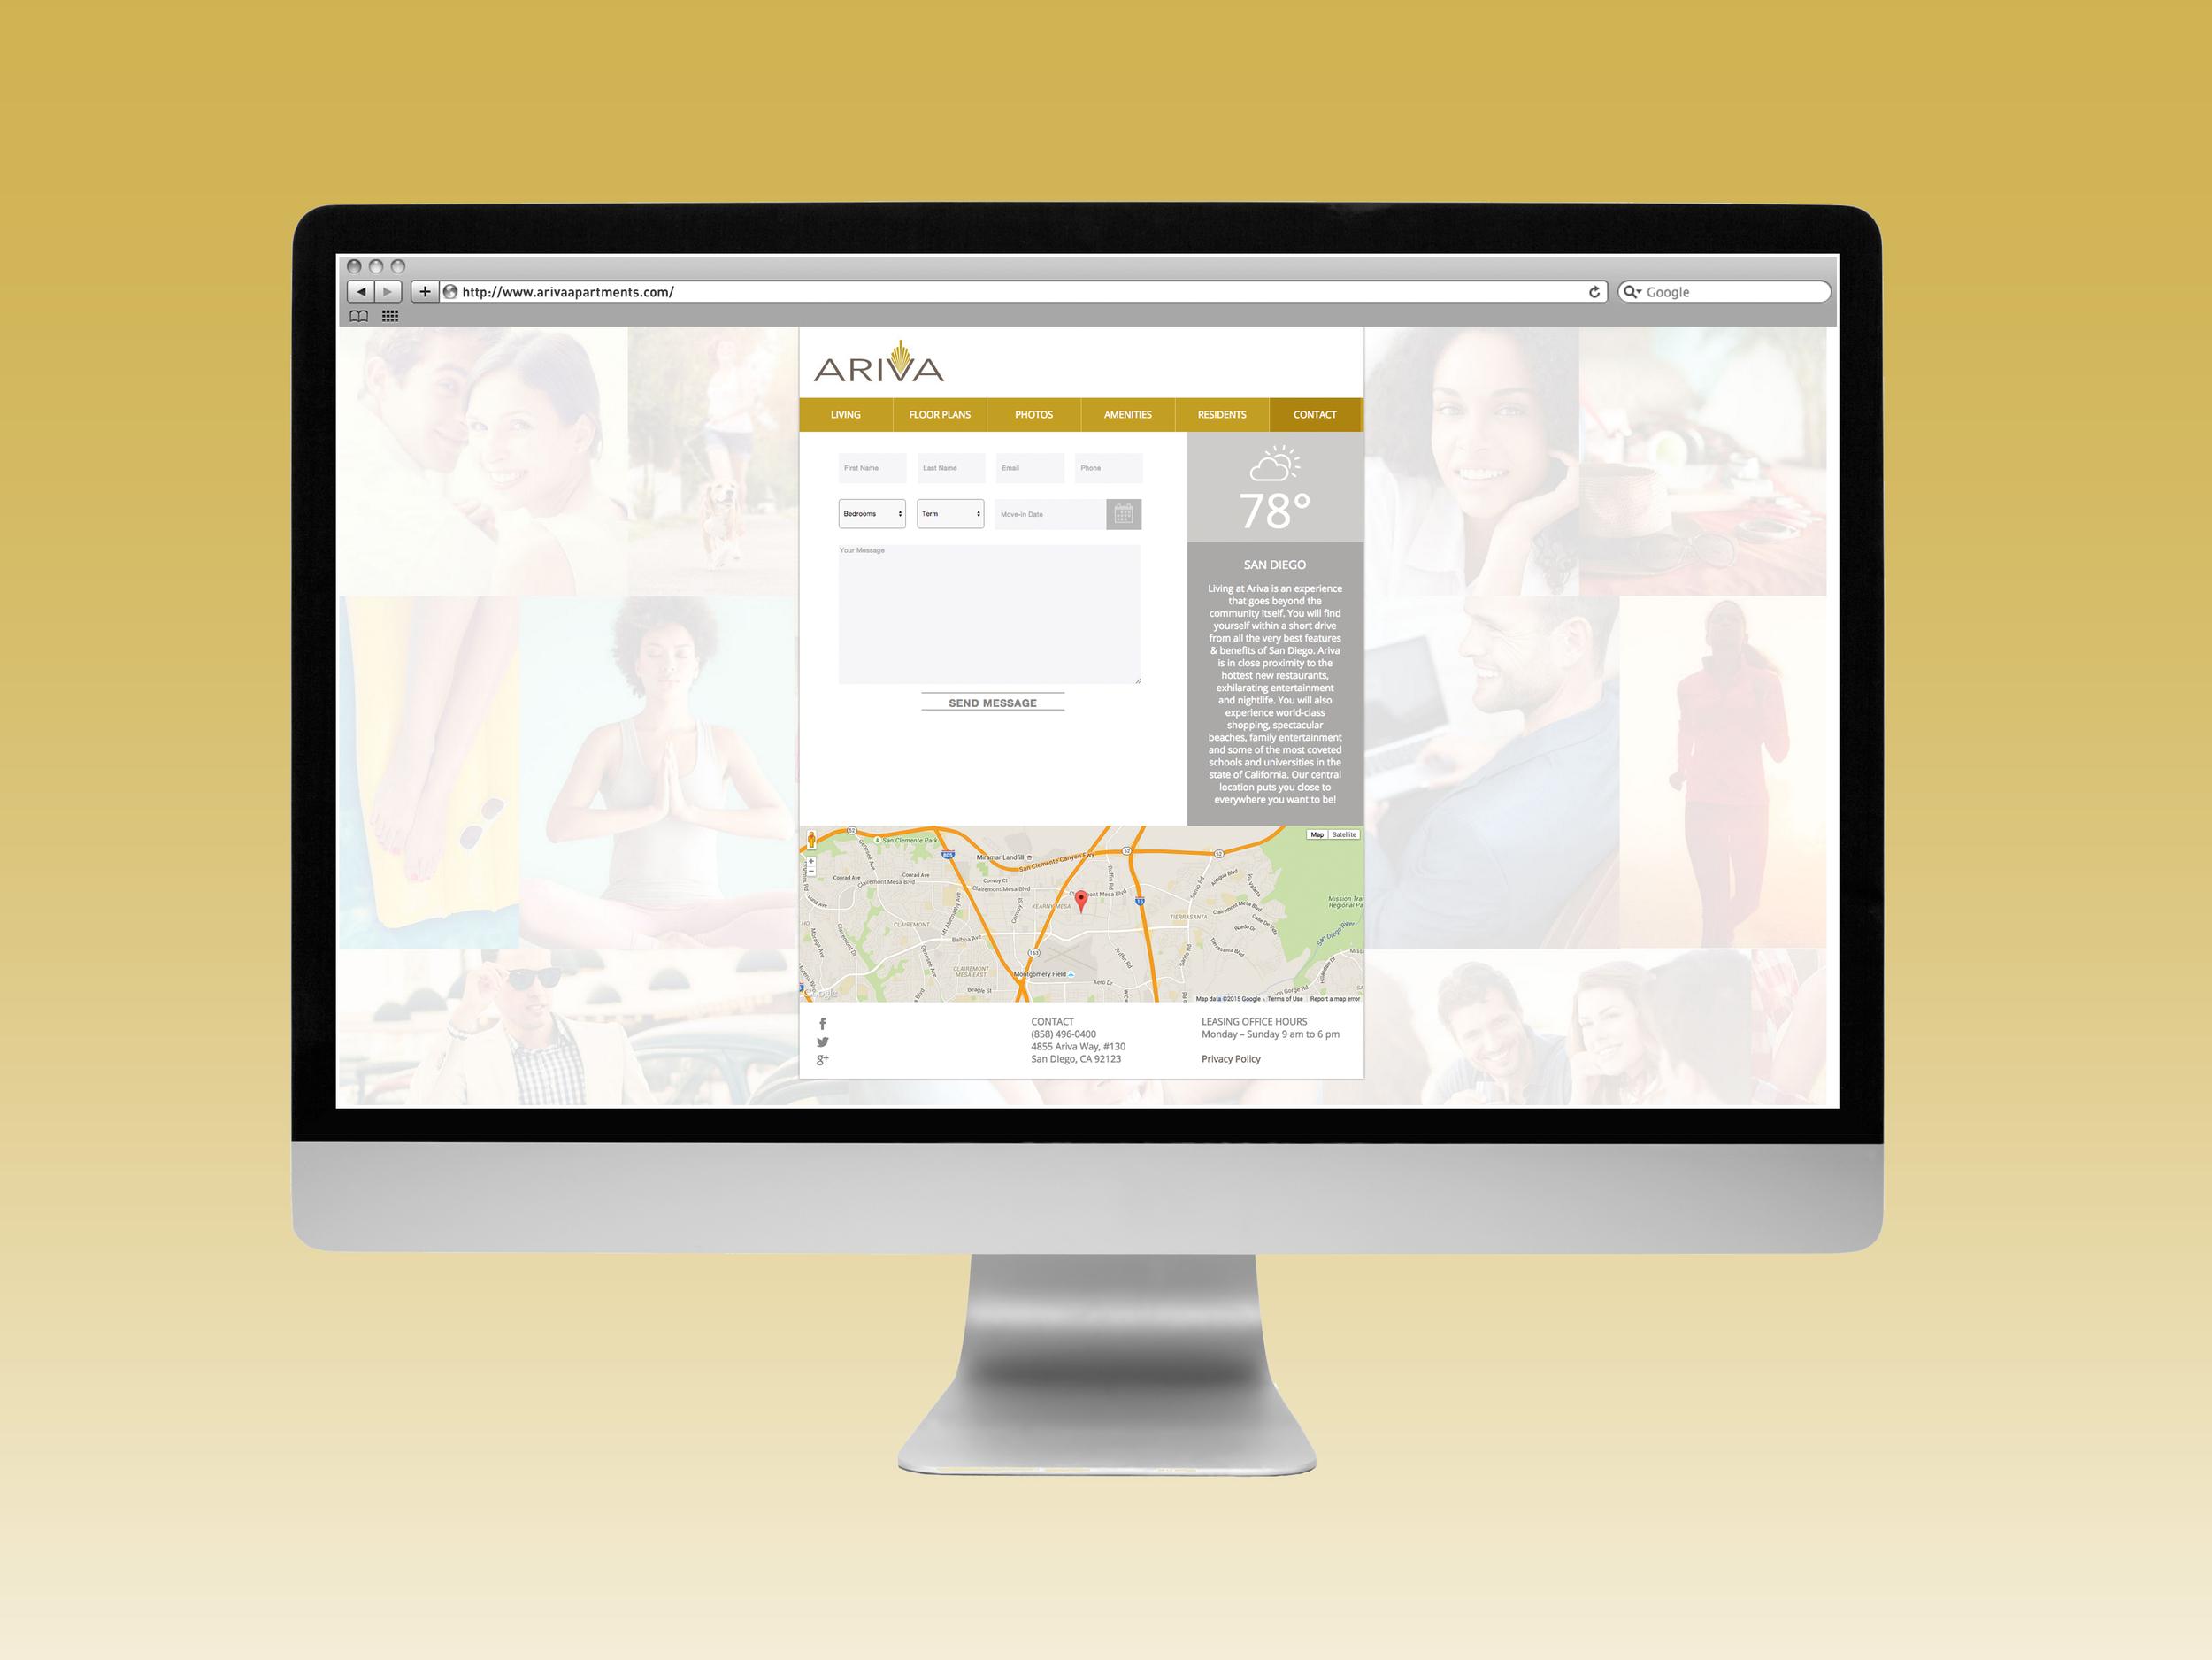 ARIVA_Website_web1 Contact.jpg